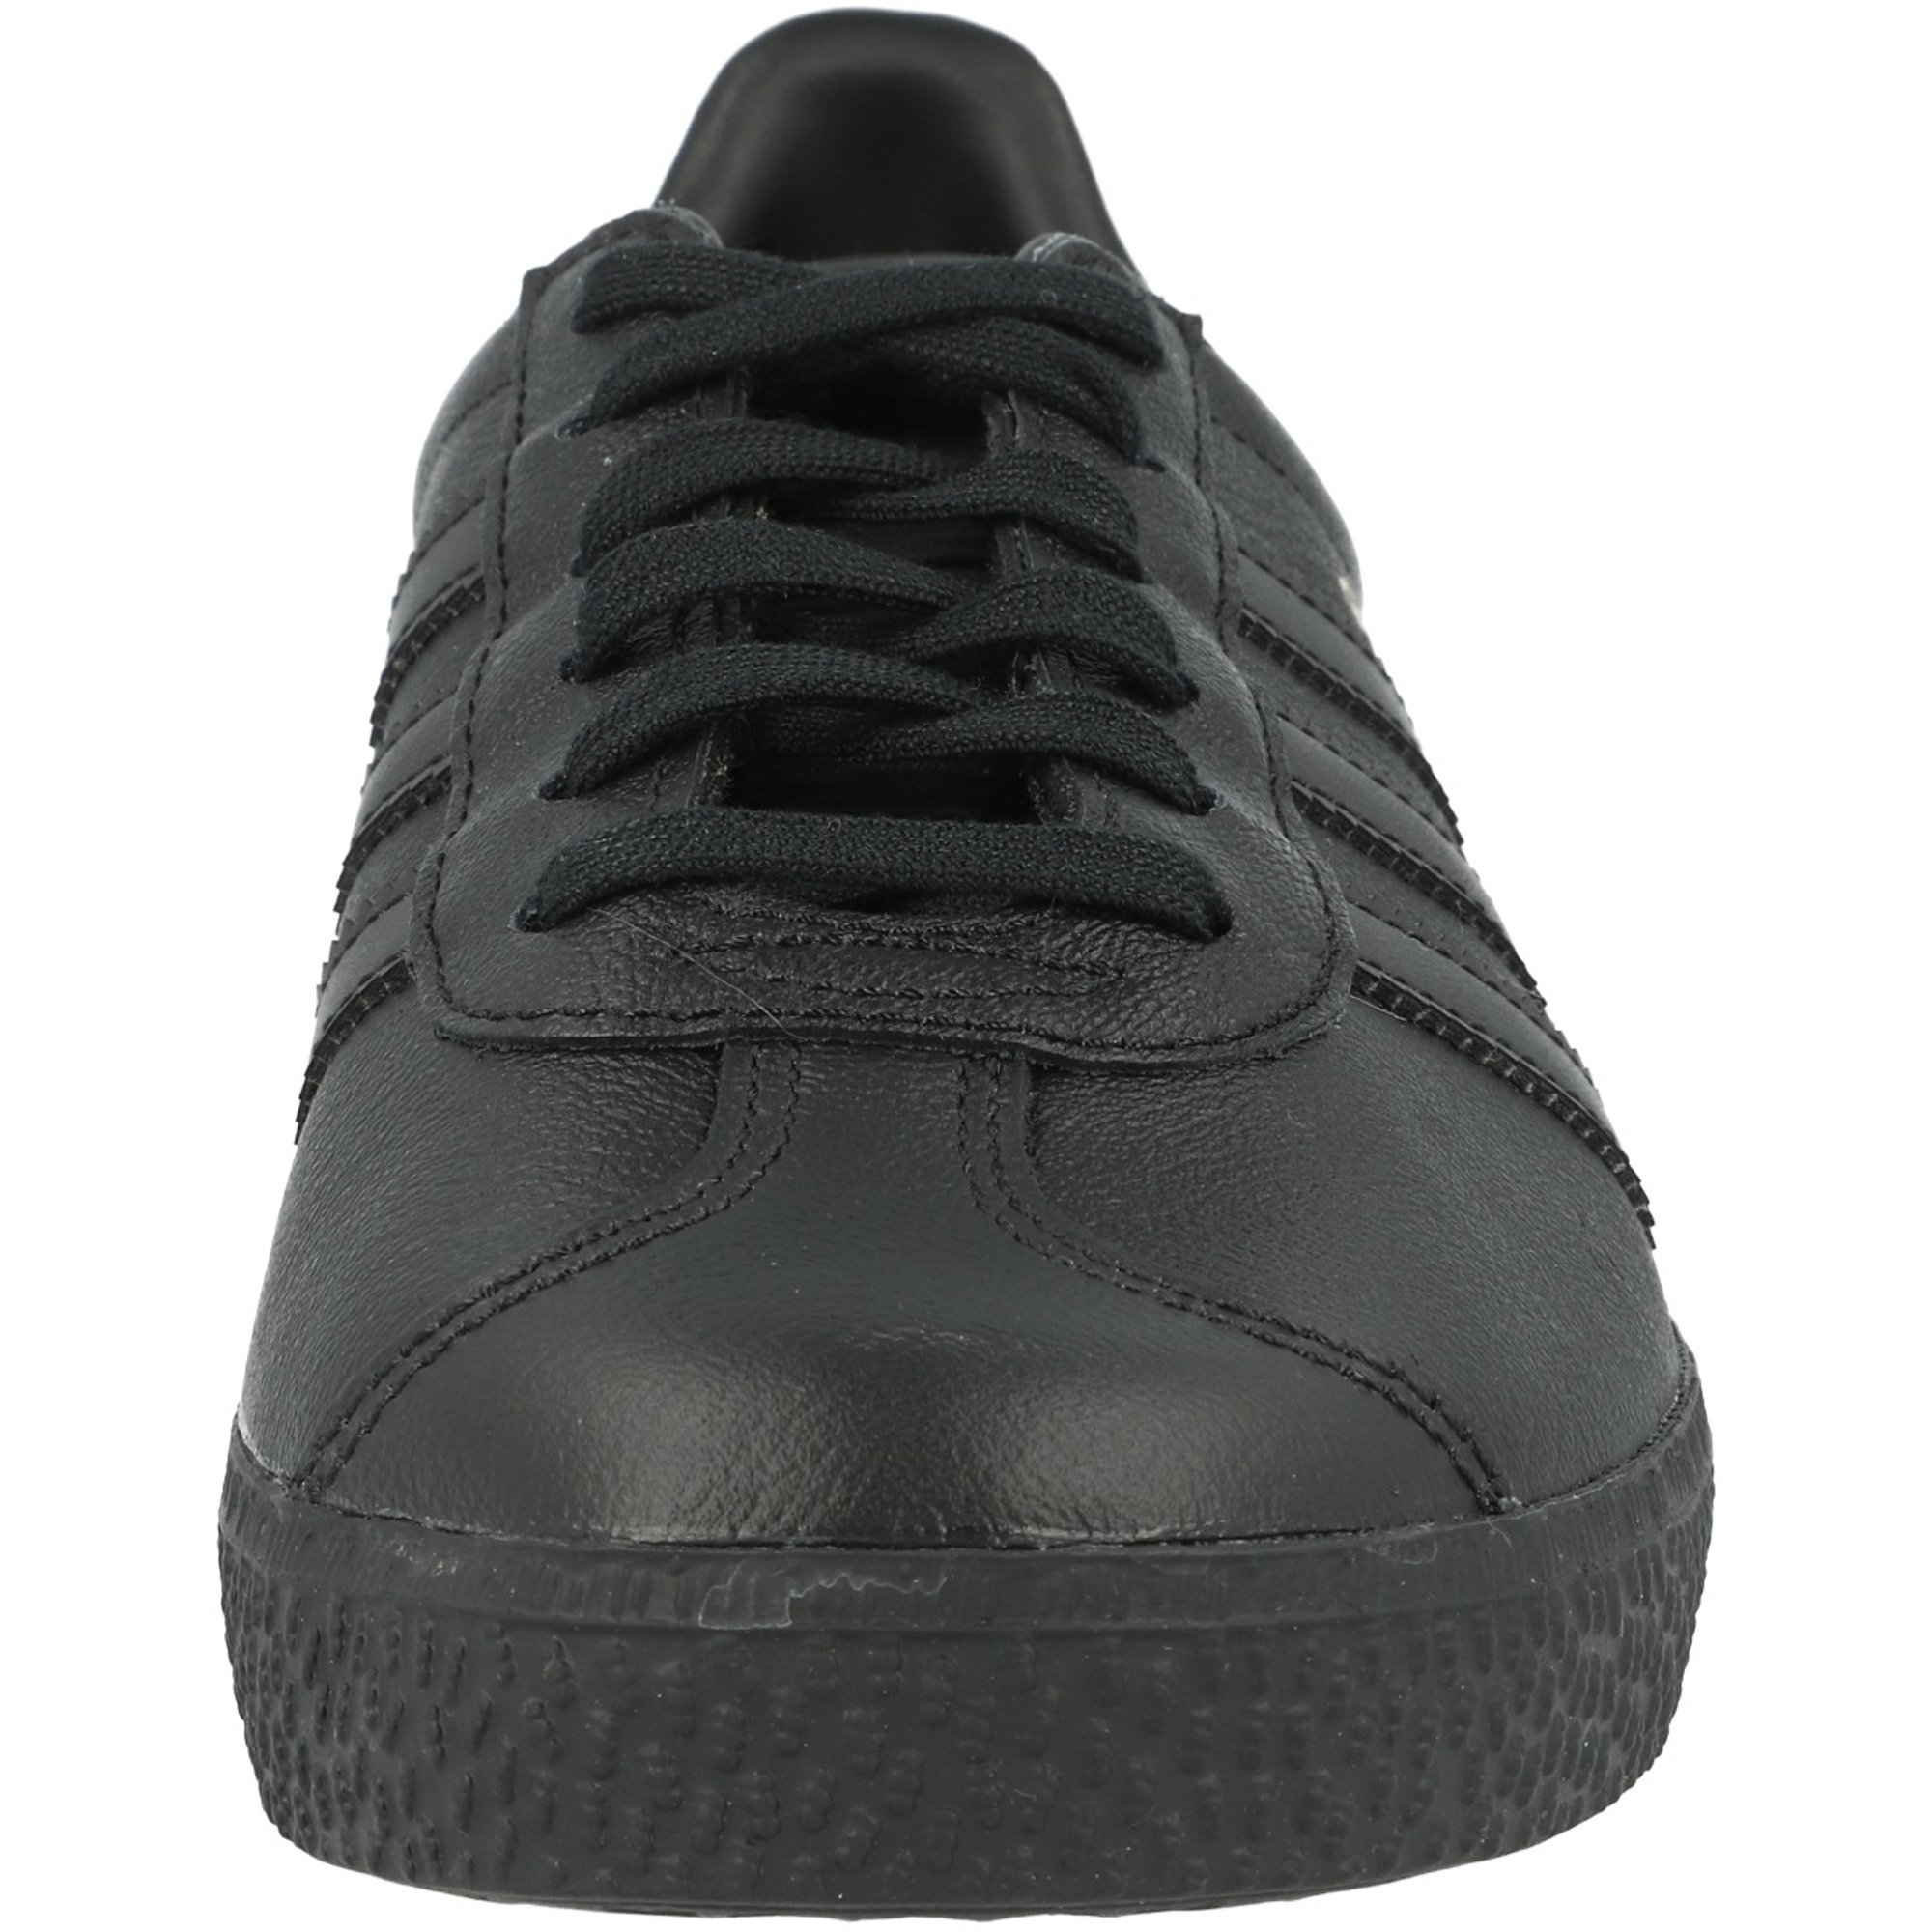 adidas Originals Gazelle J Black Leather